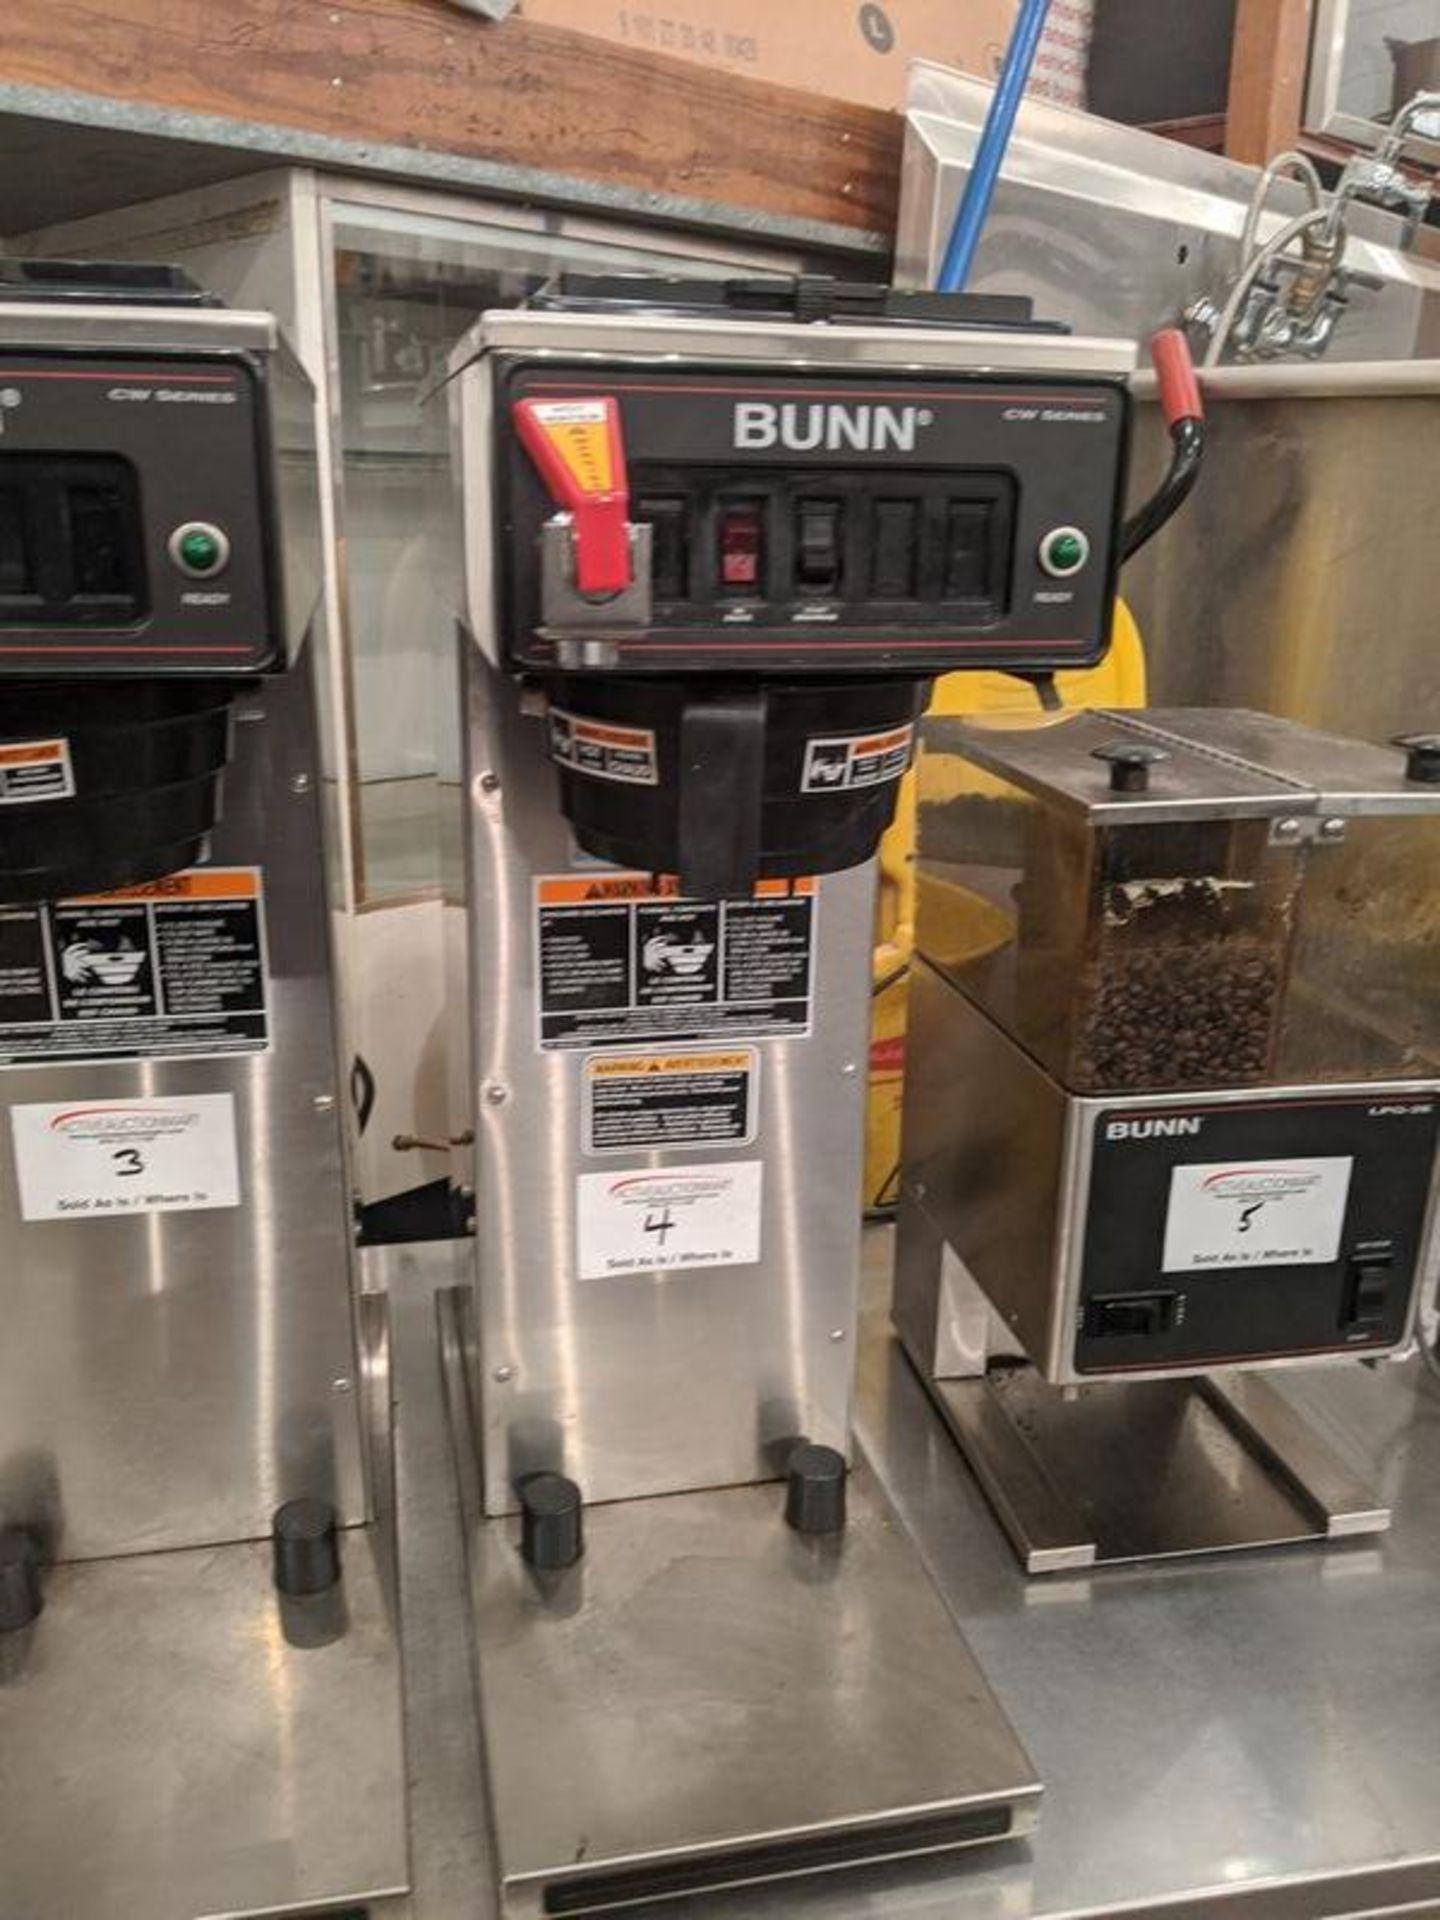 Lot 4 - Bunn Coffee Brewer